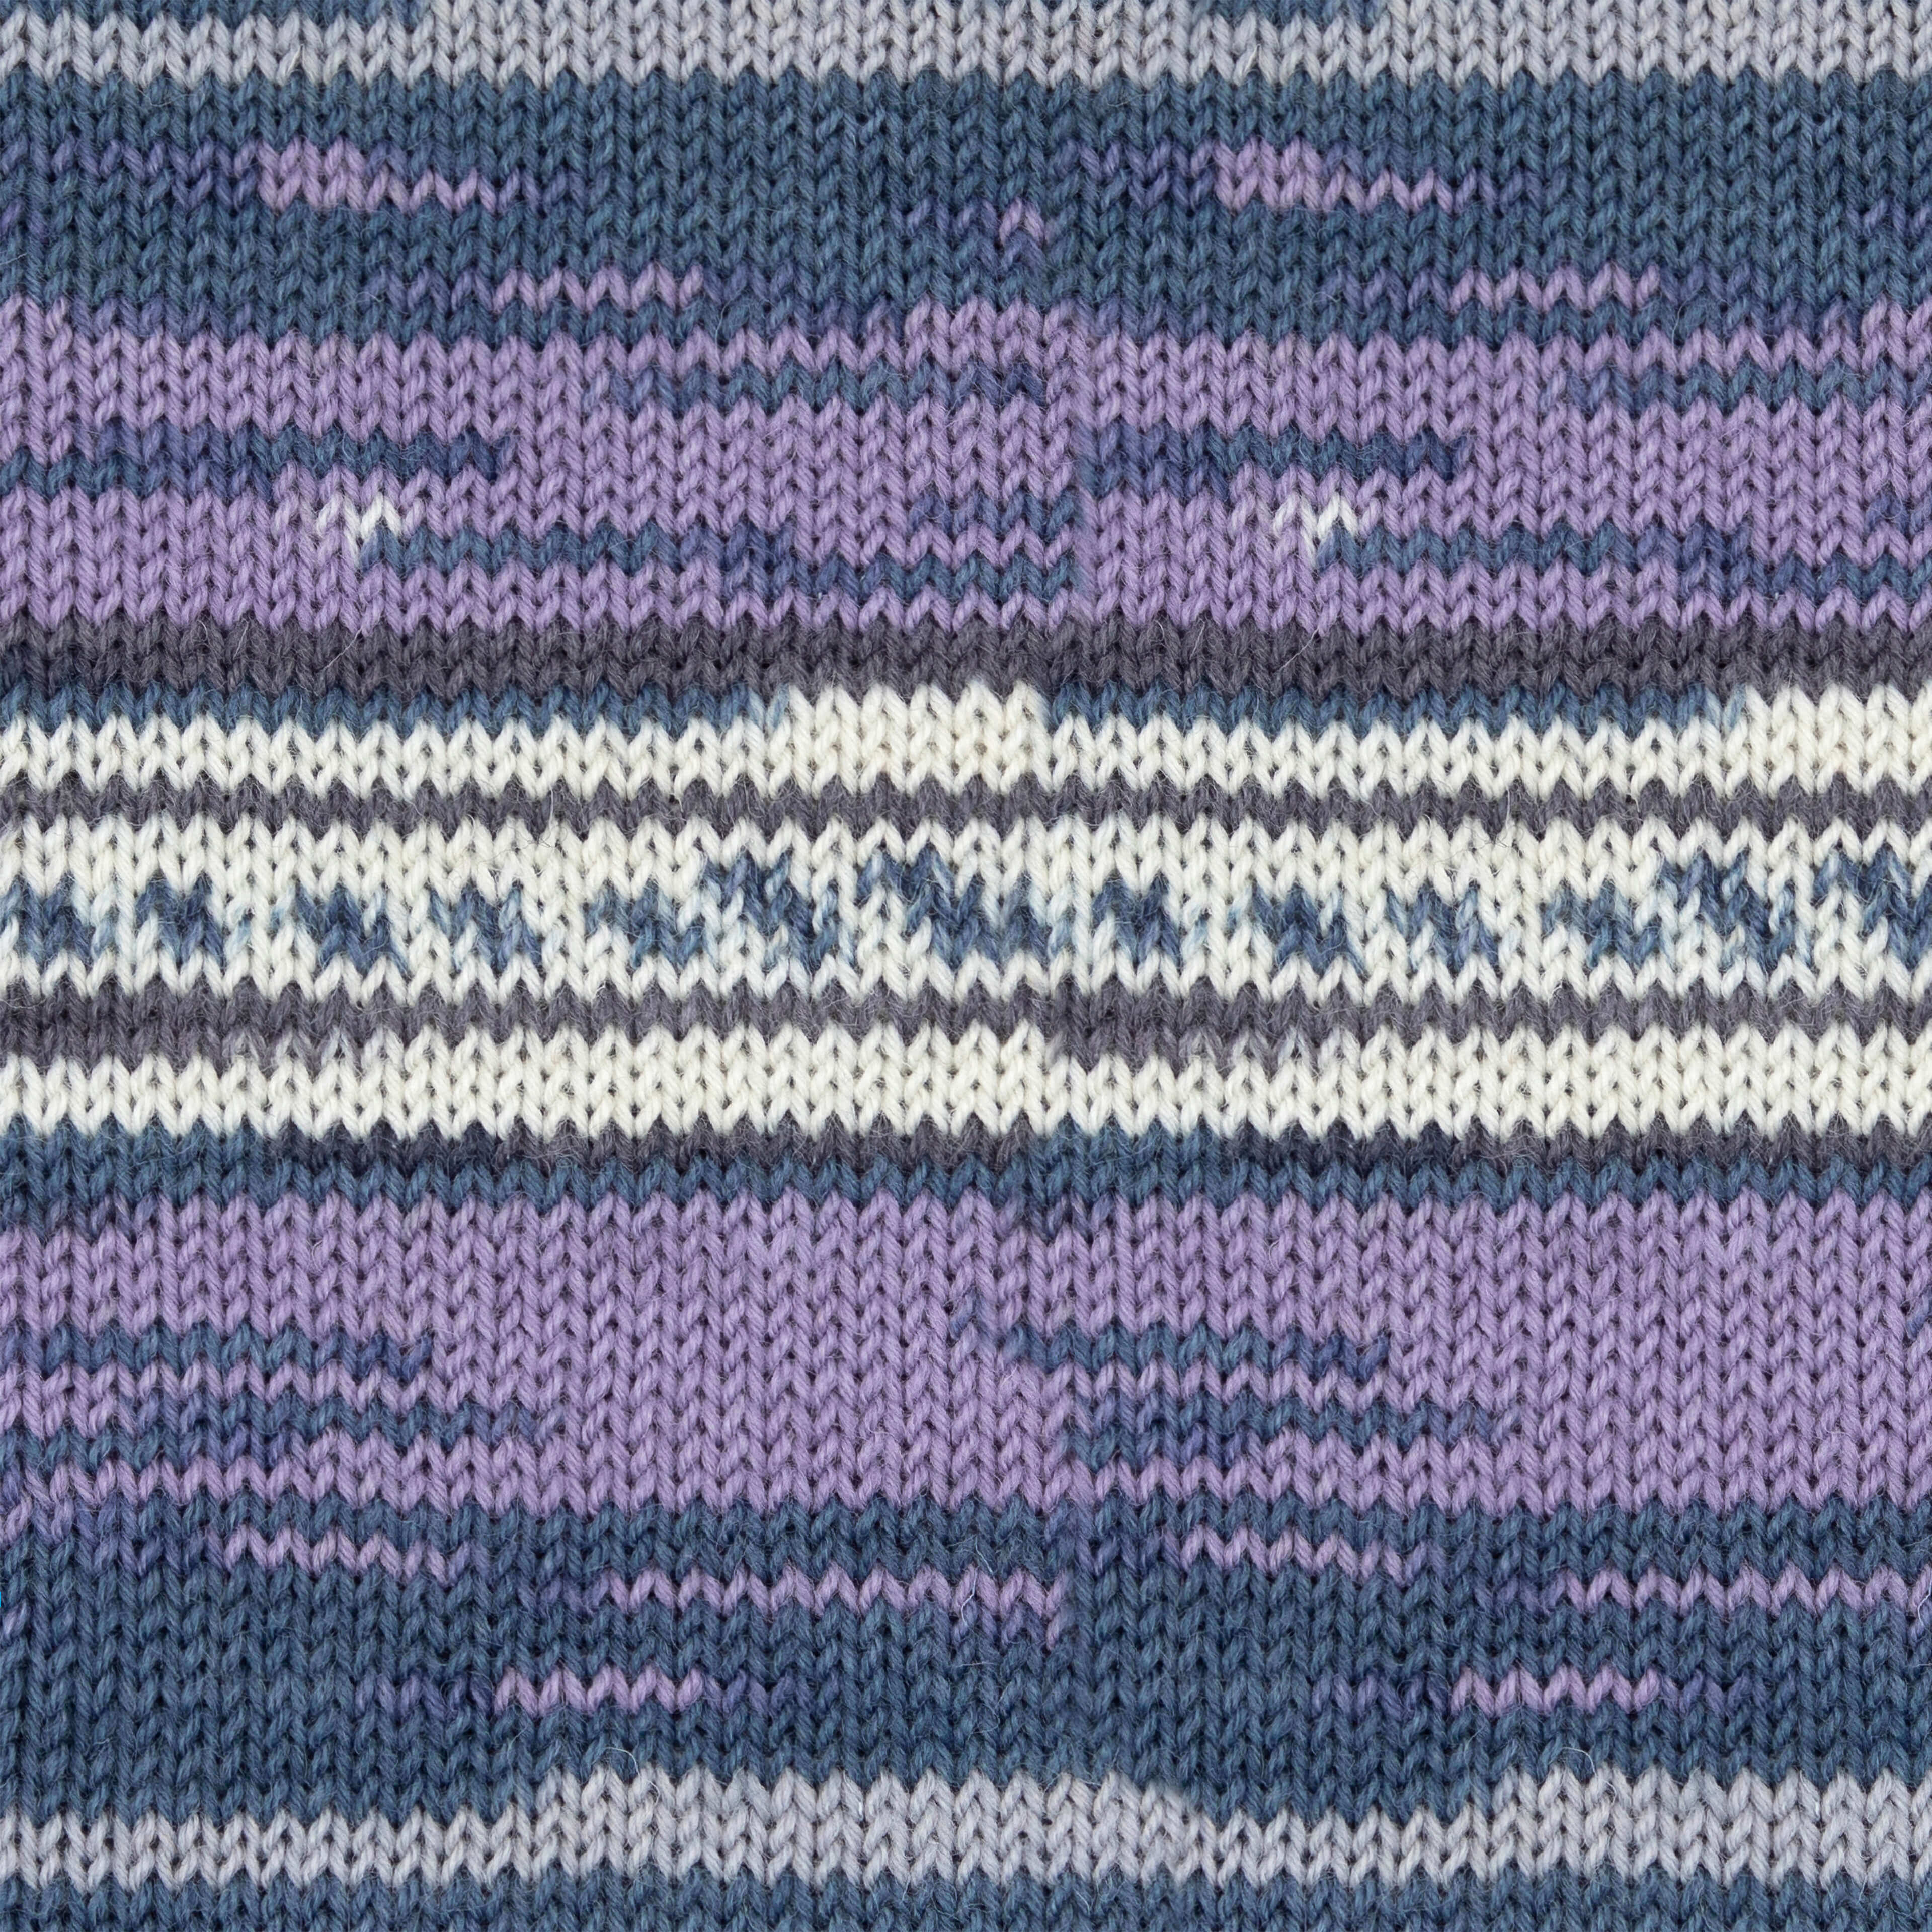 violett-kobalt-natur